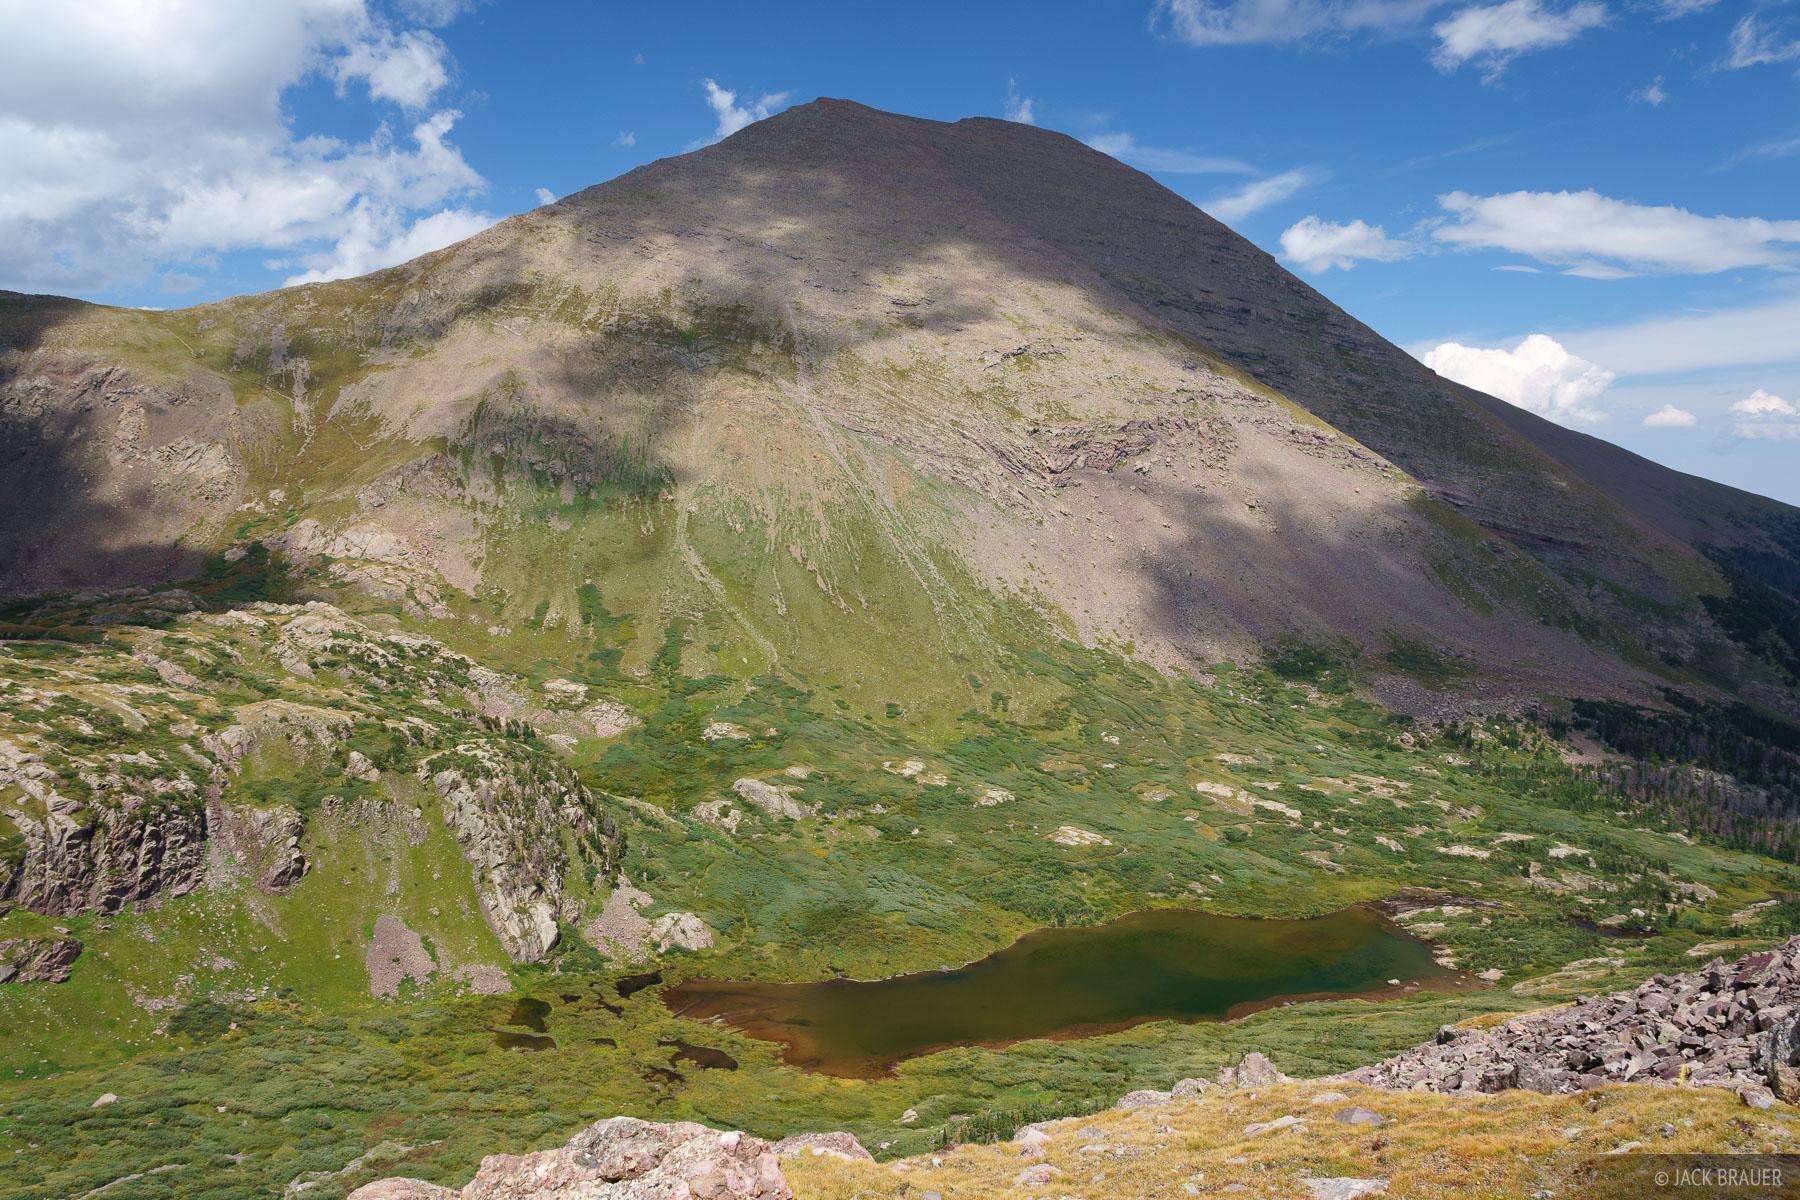 Colorado, Humboldt Peak, Sangre de Cristos, South Colony Lake, 14er, Sangre de Cristo Wilderness, photo